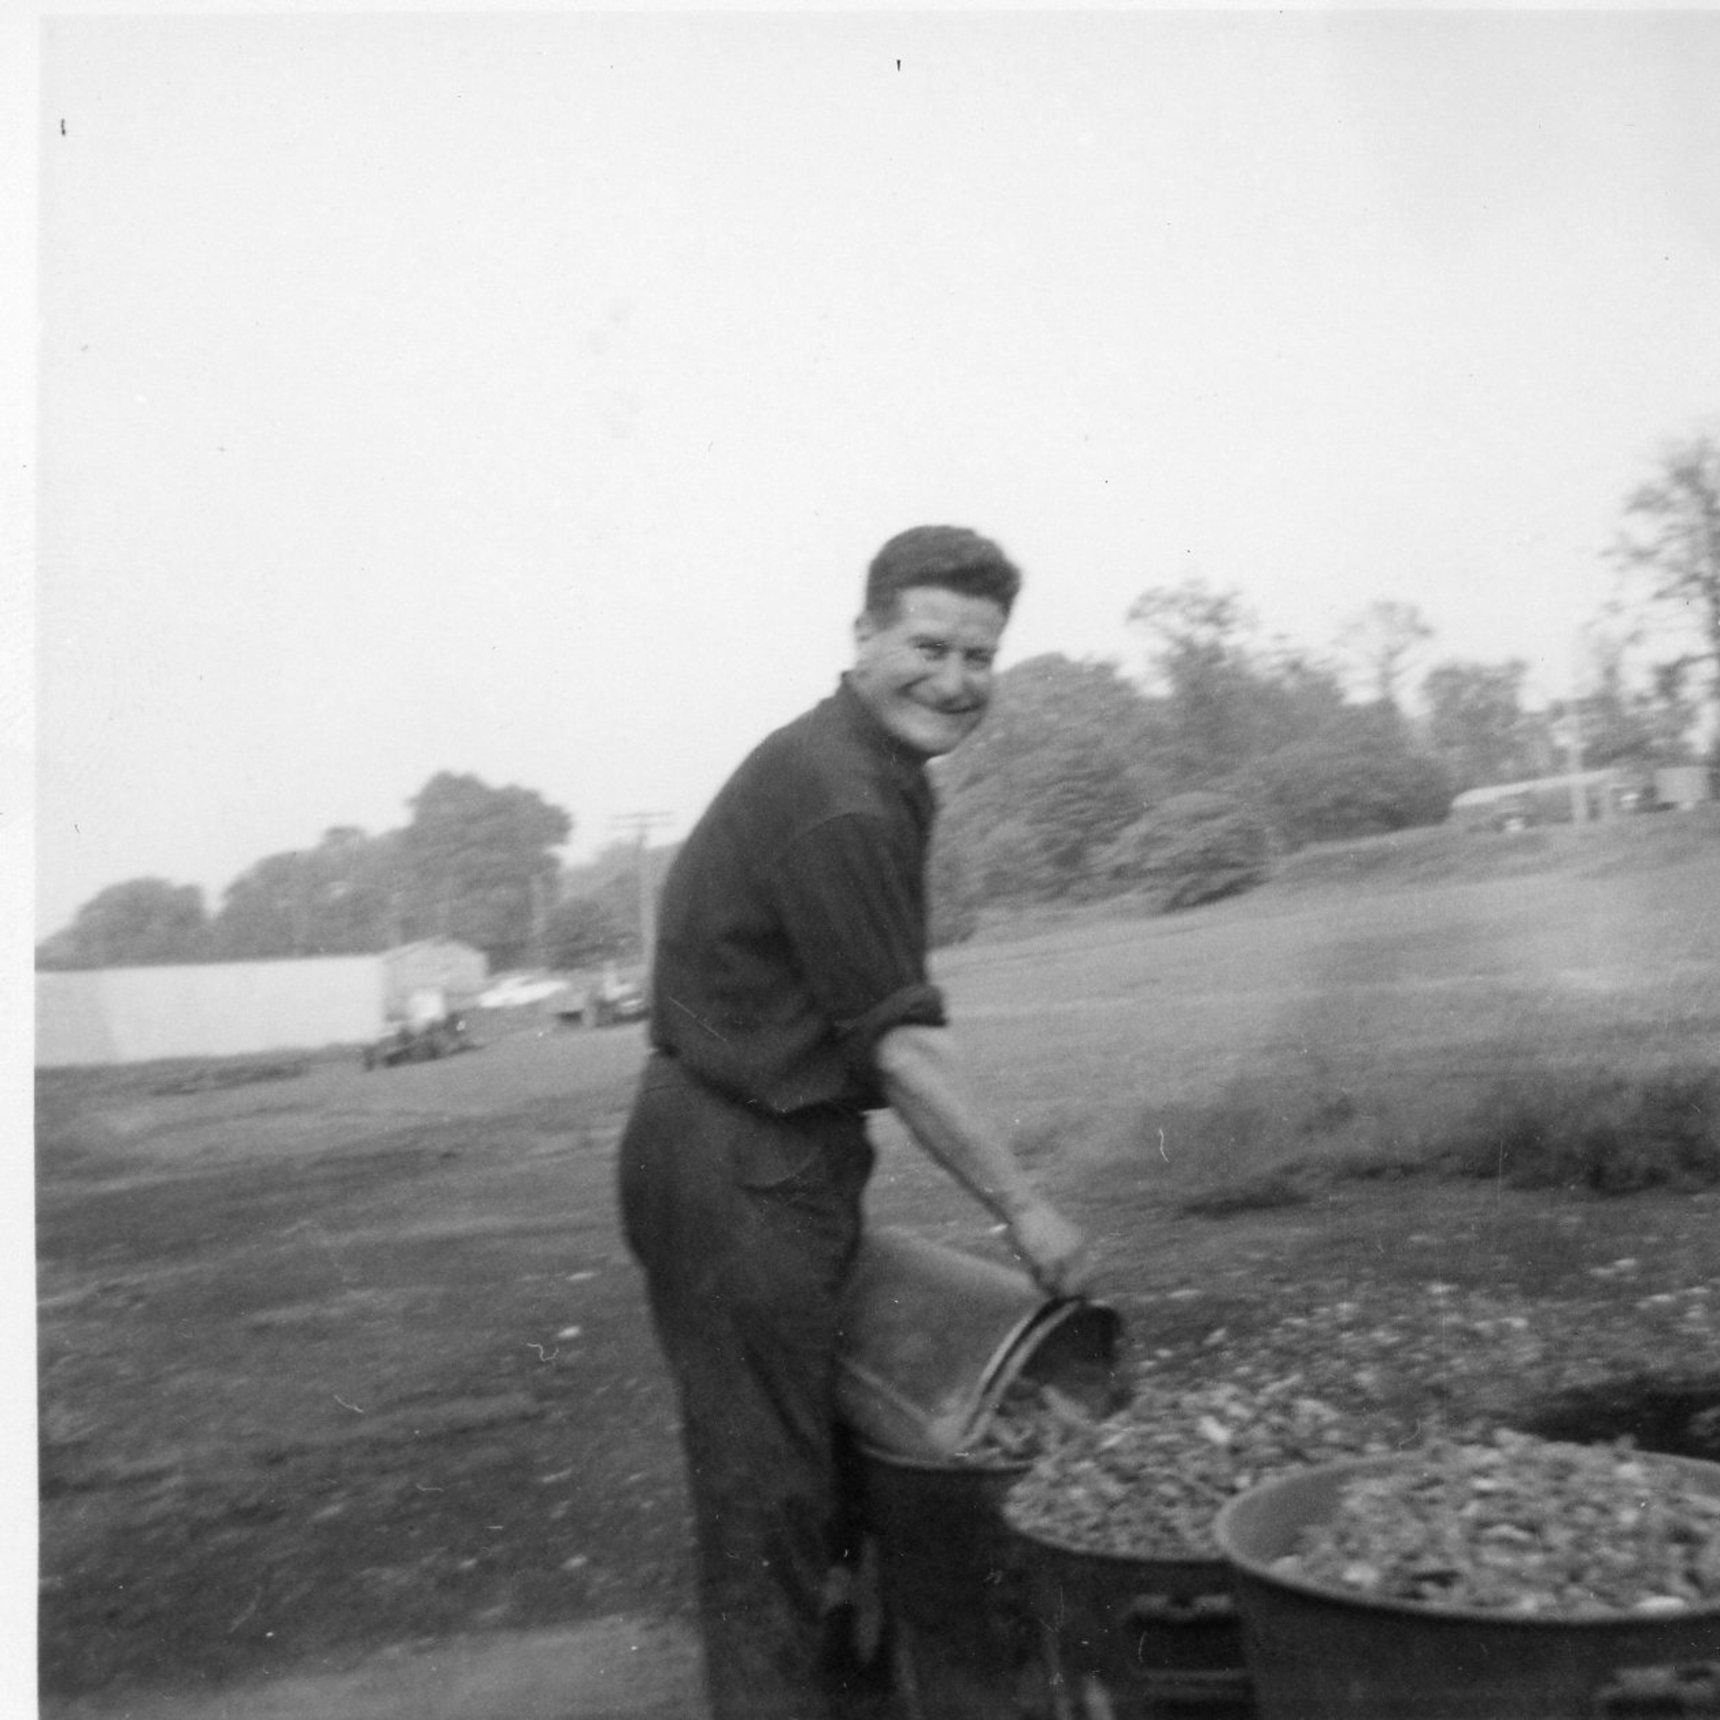 Man at work, (construction?), Oxgangs